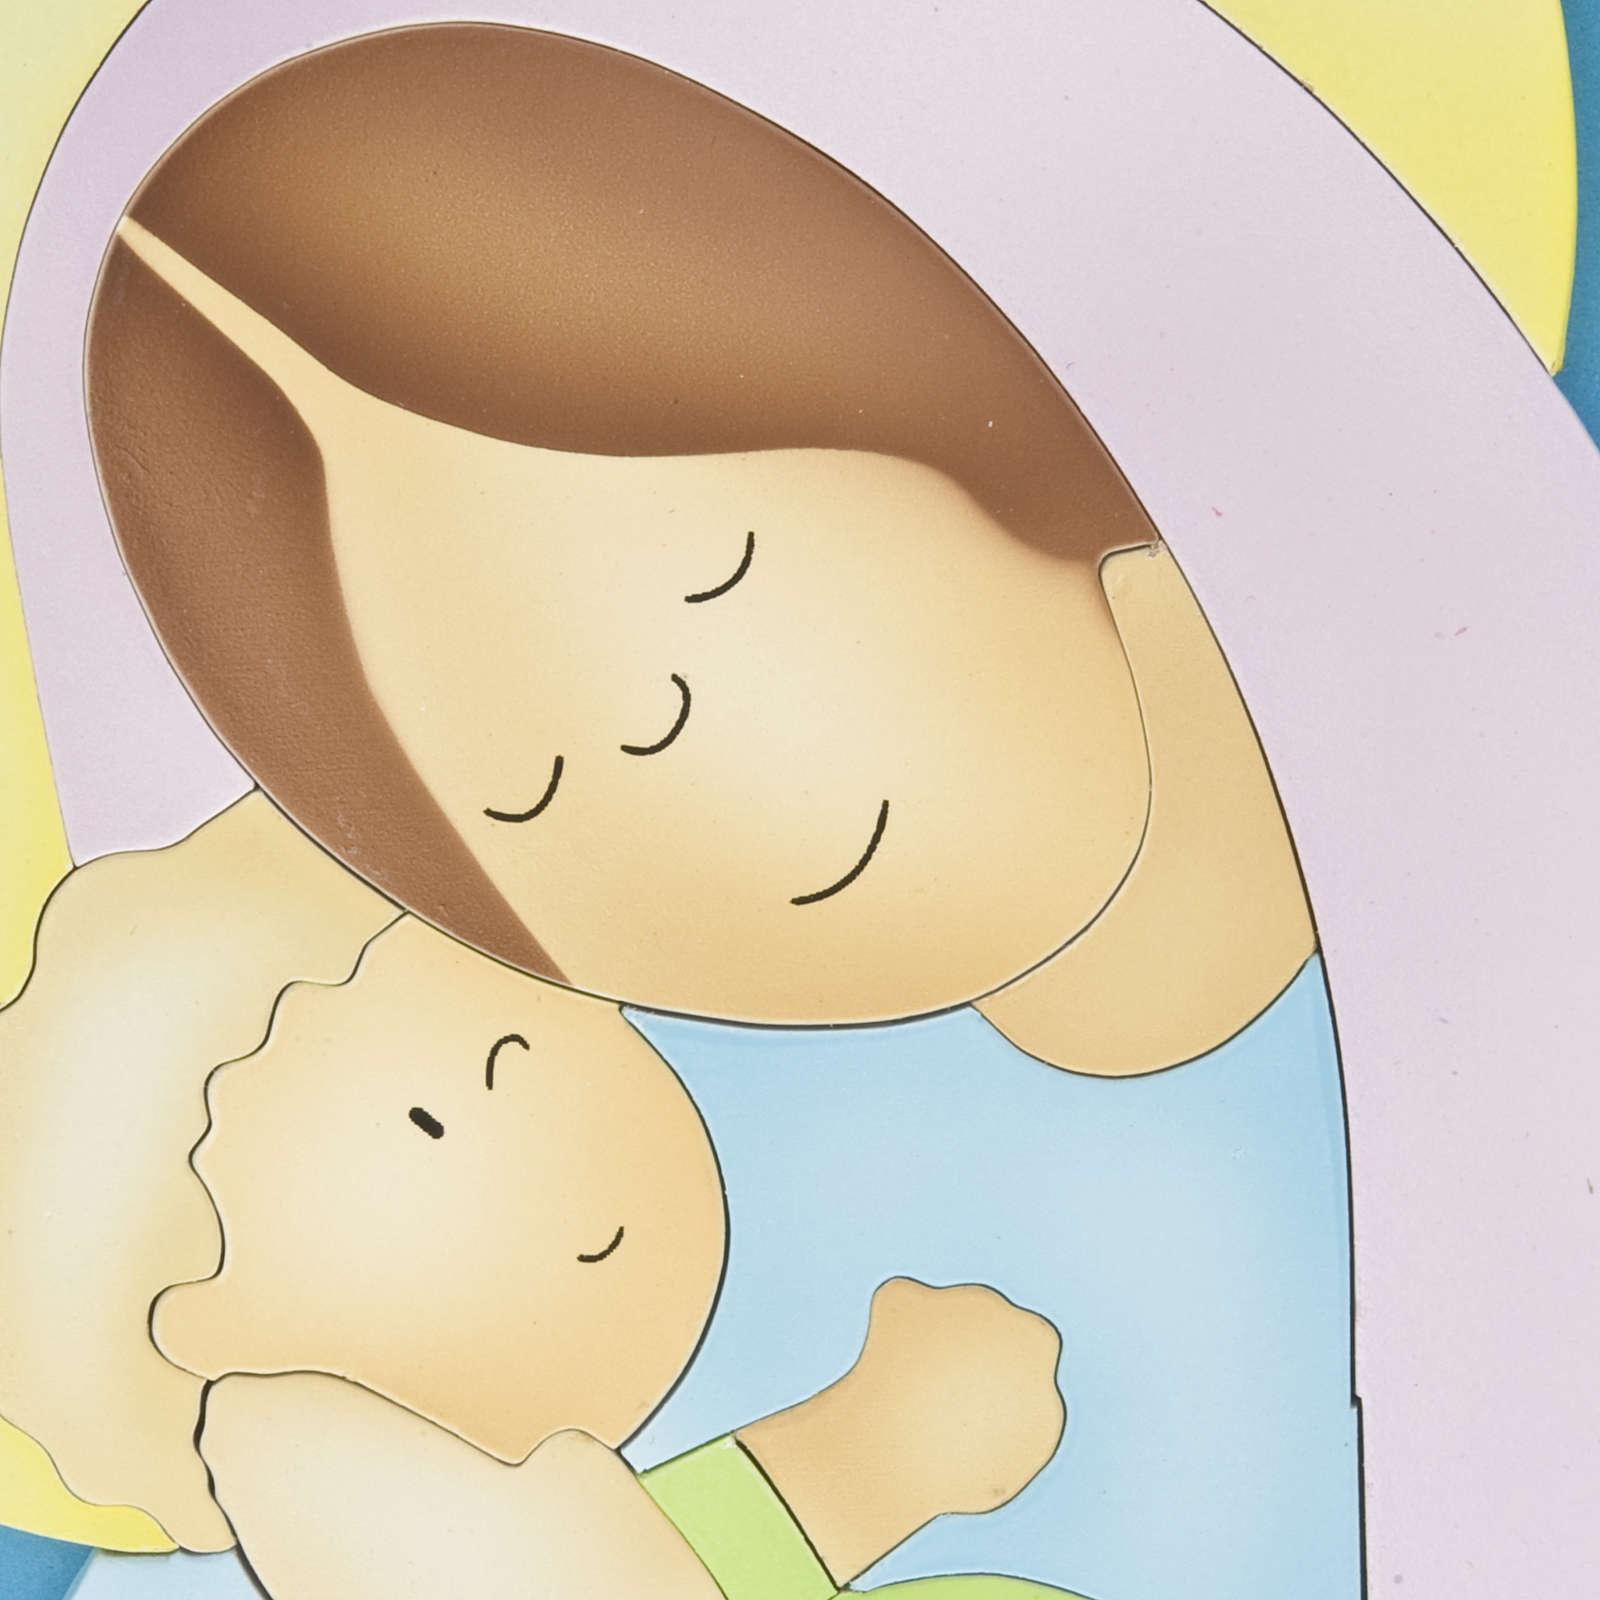 Pala bassorilievo Madonna con bambino 4